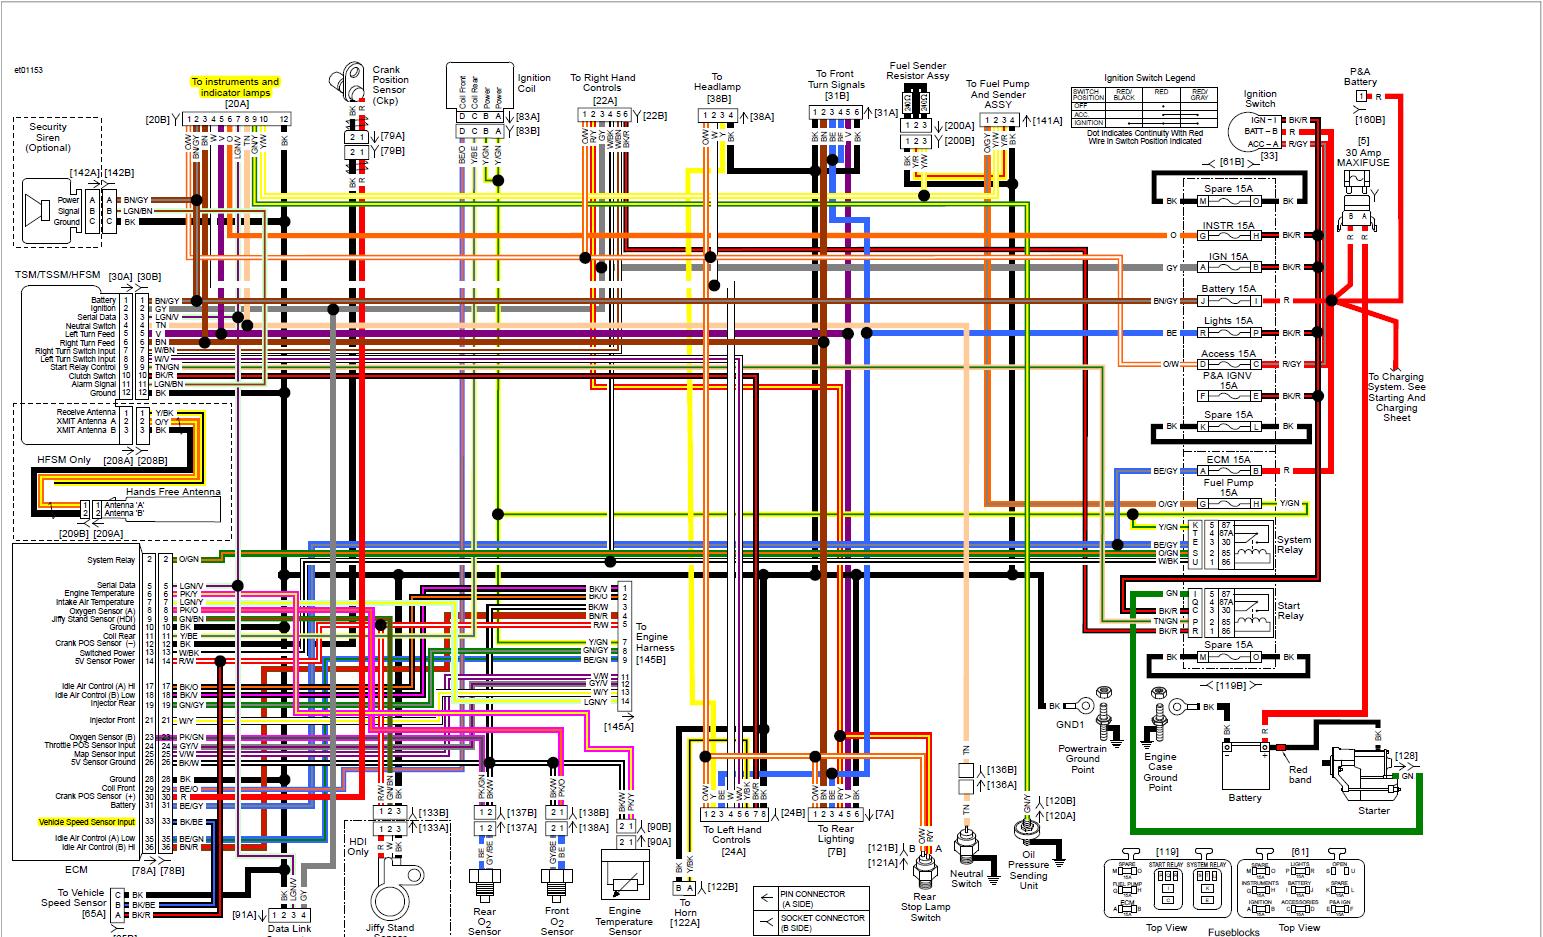 Harley Sd Sensor Wiring Diagram Wiring Diagram Cow Information Cow Information Led Illumina It